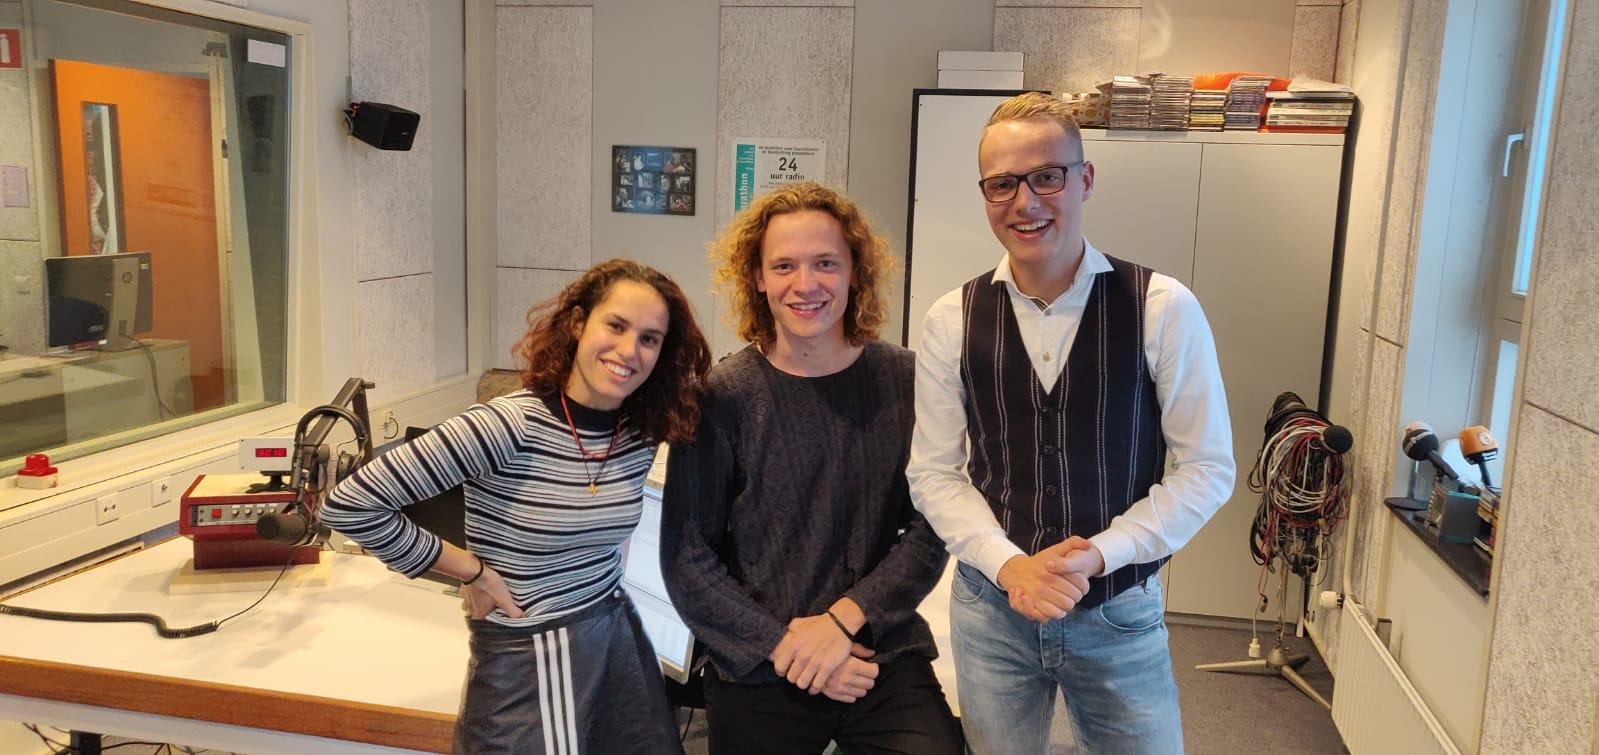 Podcast Biljardair: Nederlands kampioen Jop de Jong over biljart-artistiek